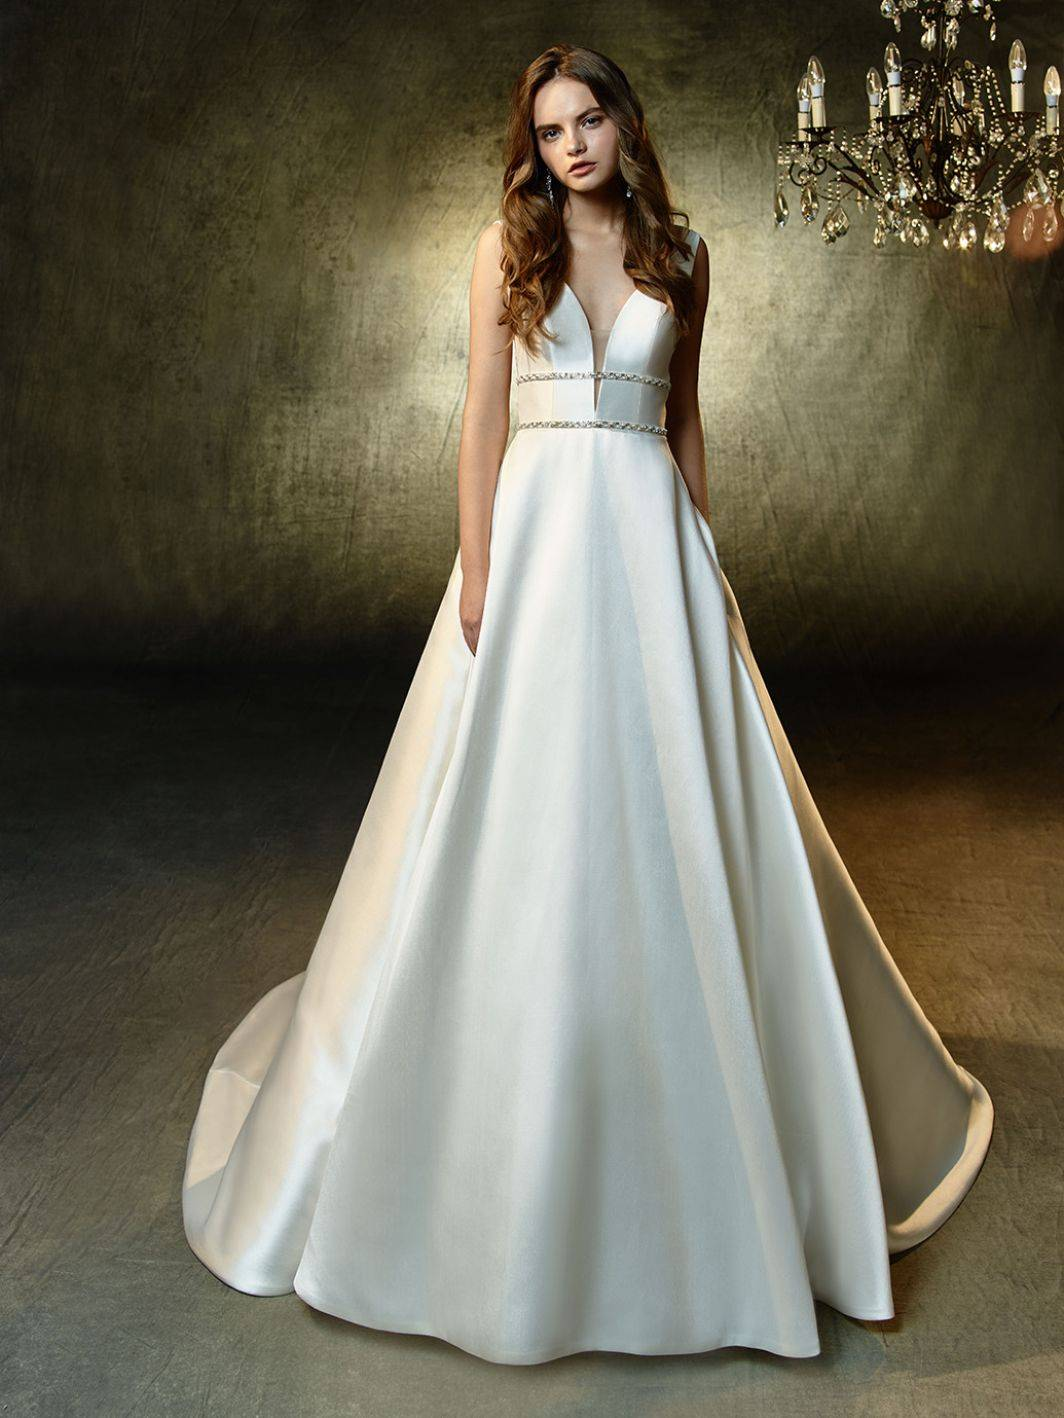 ENZOANI WEDDING DRESS LEANDRA